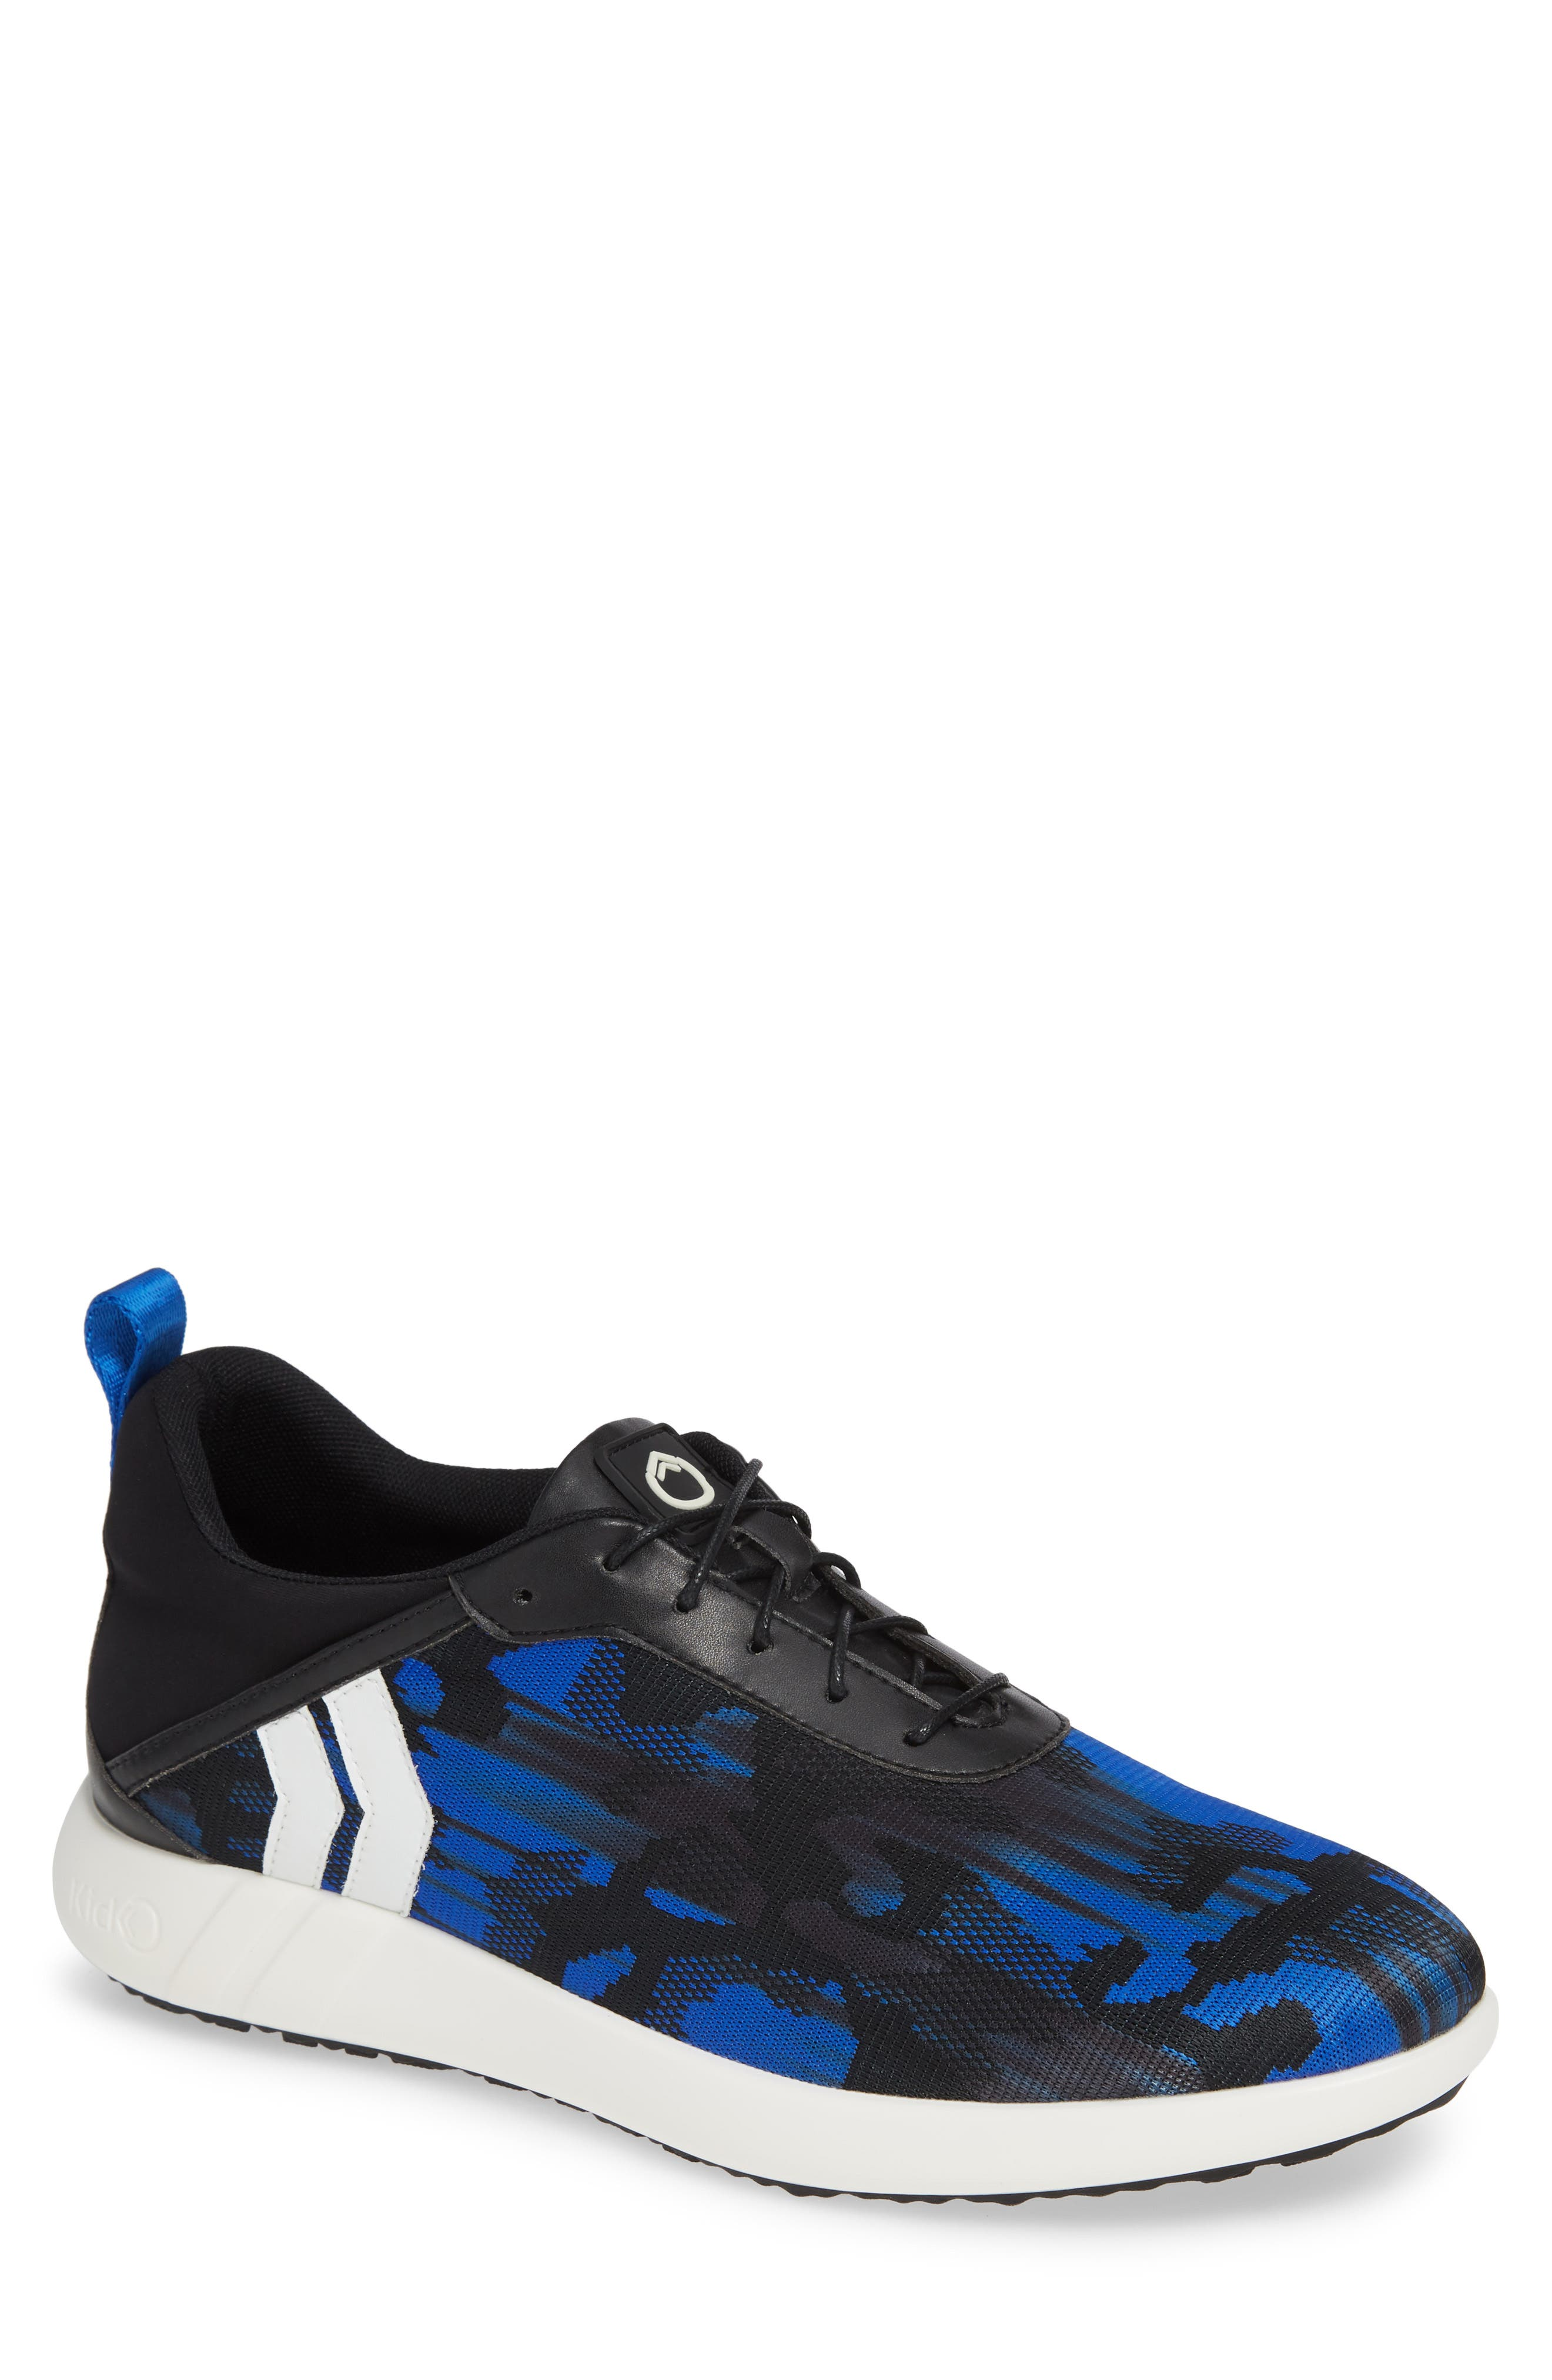 Ghost Sneaker,                         Main,                         color, 430